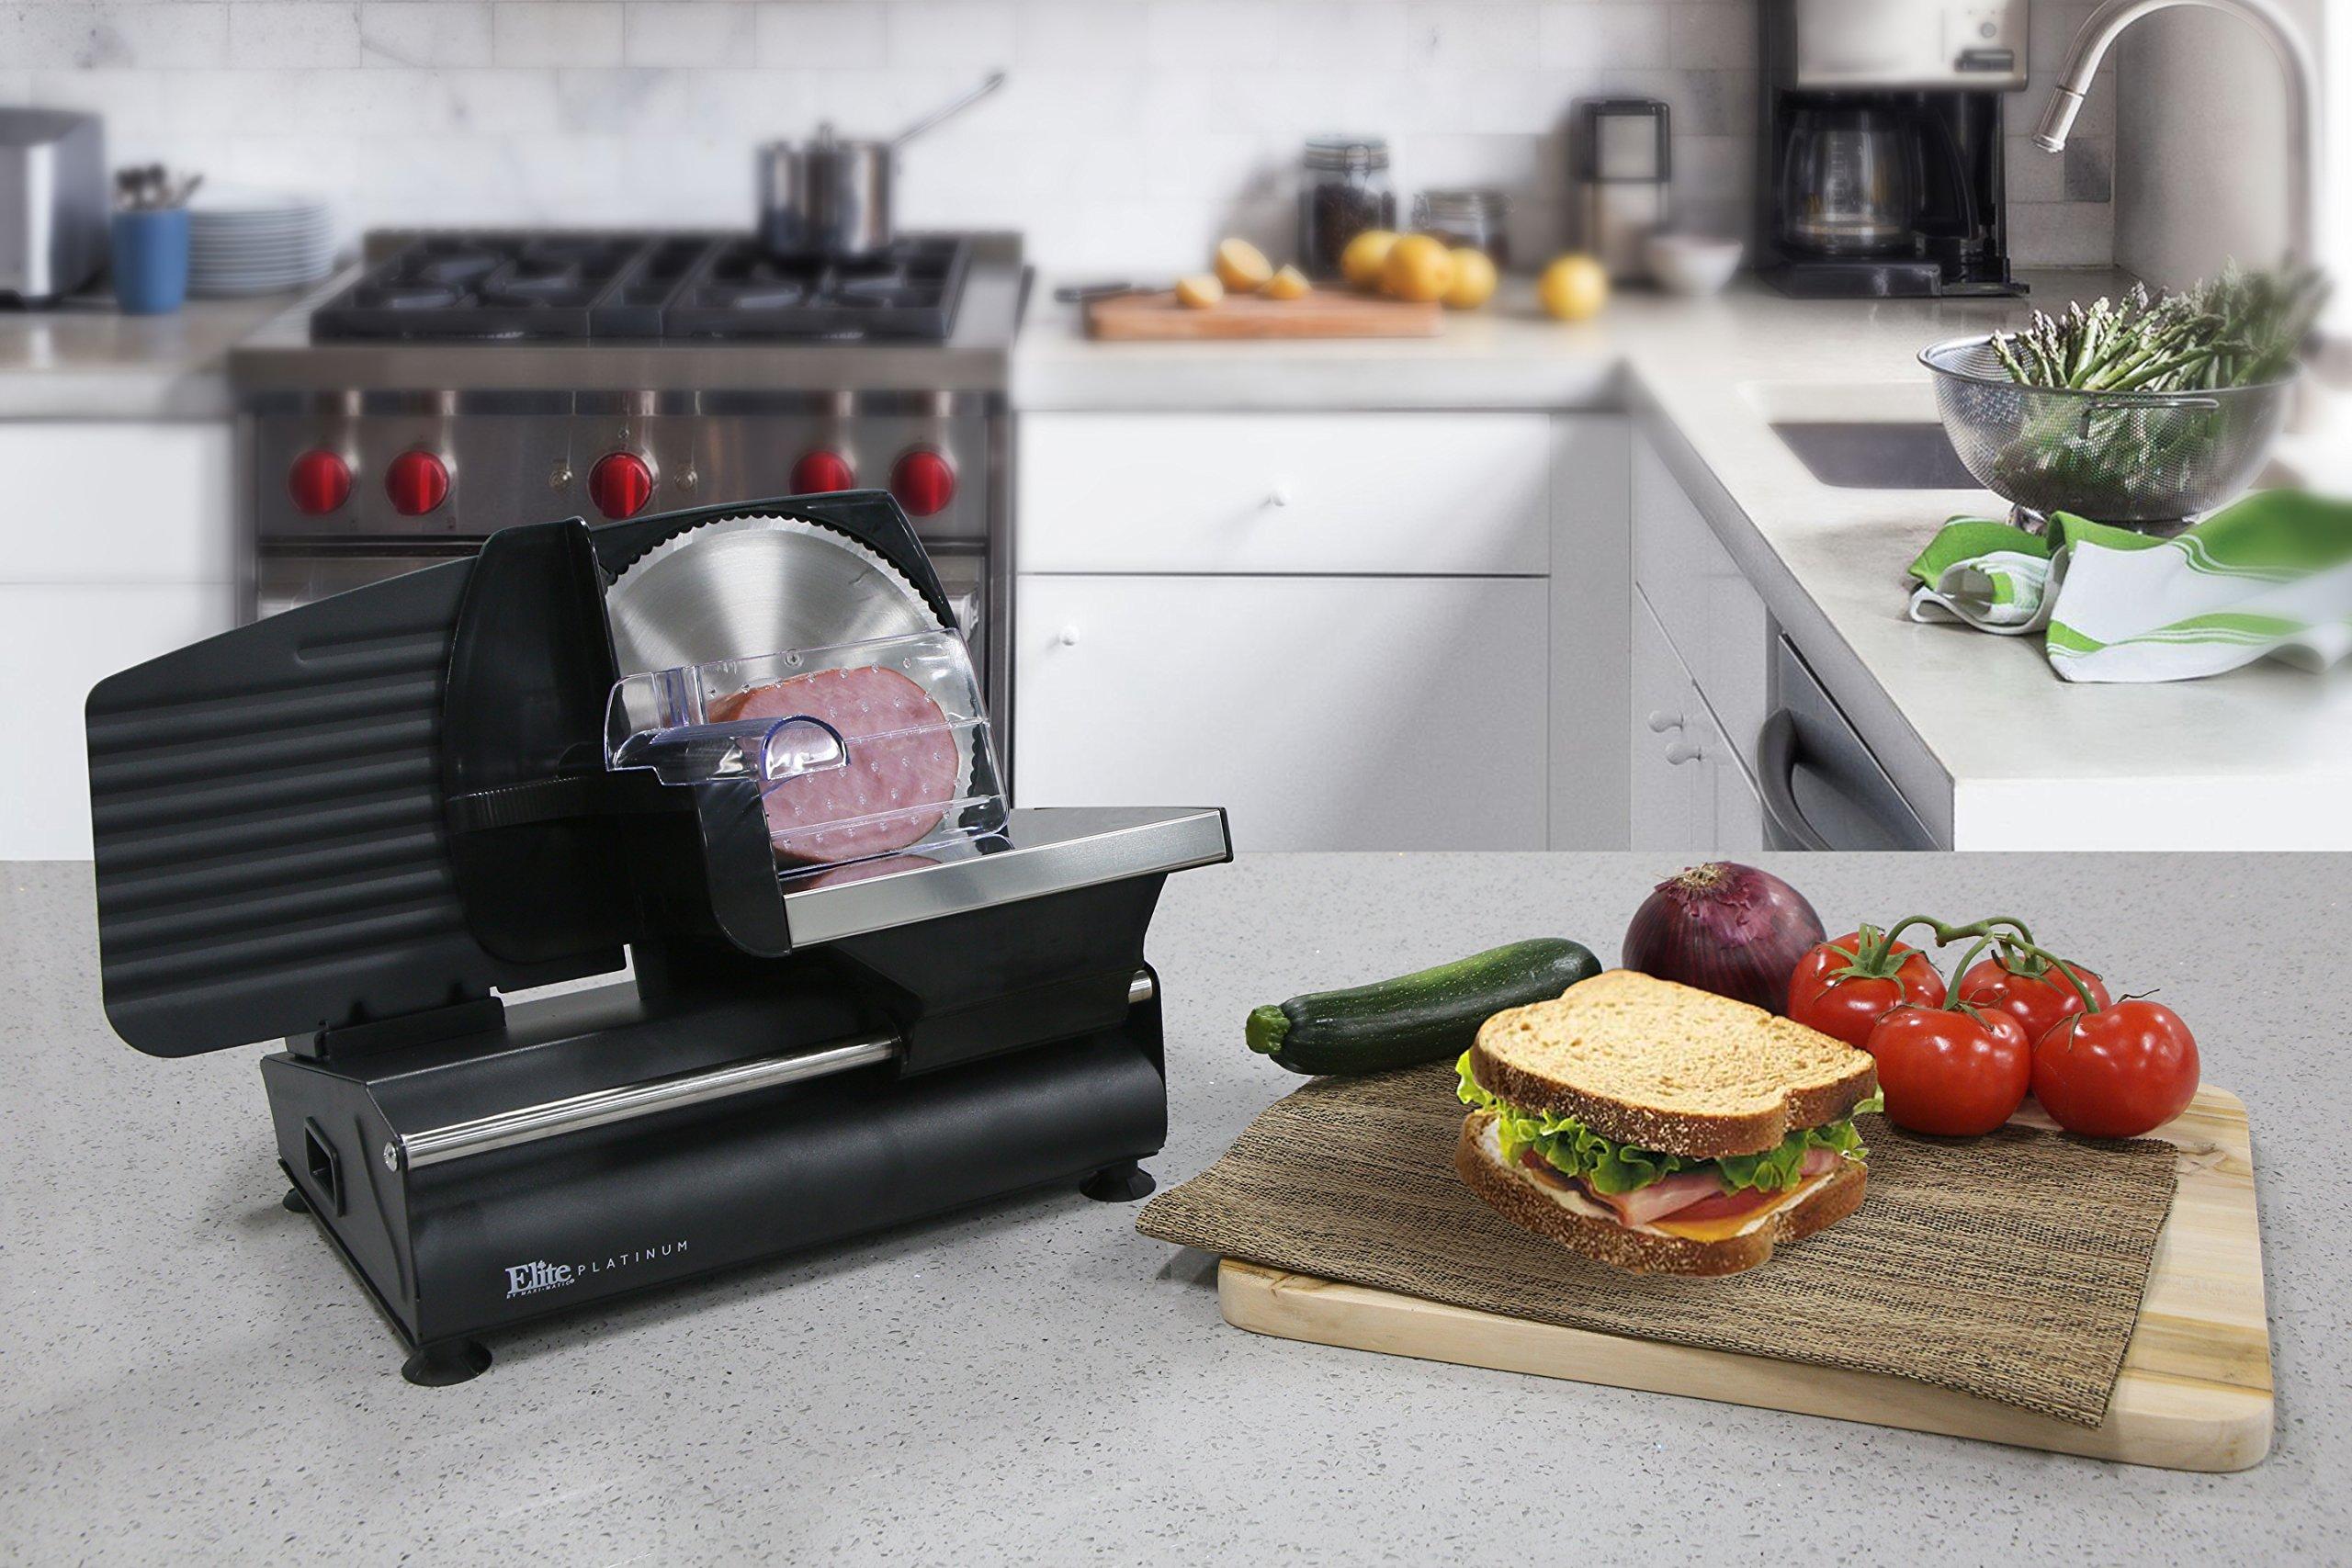 Galleon elite gourmet emt 503b maxi matic 130 watt die cast aluminum electric food slicer black for Kitchen set toys r us philippines